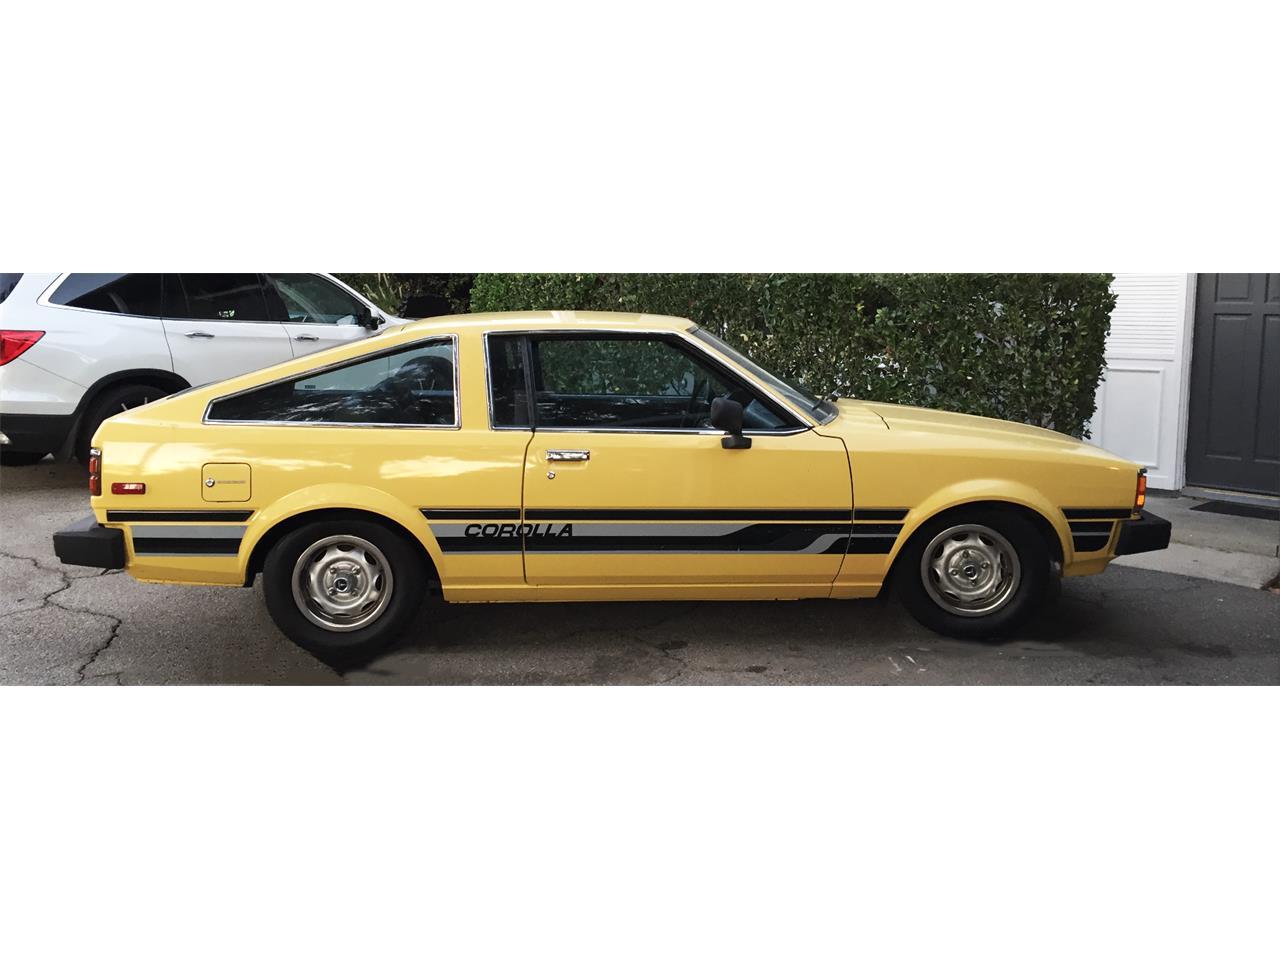 1980 toyota corolla for sale   classiccars   cc-1089424